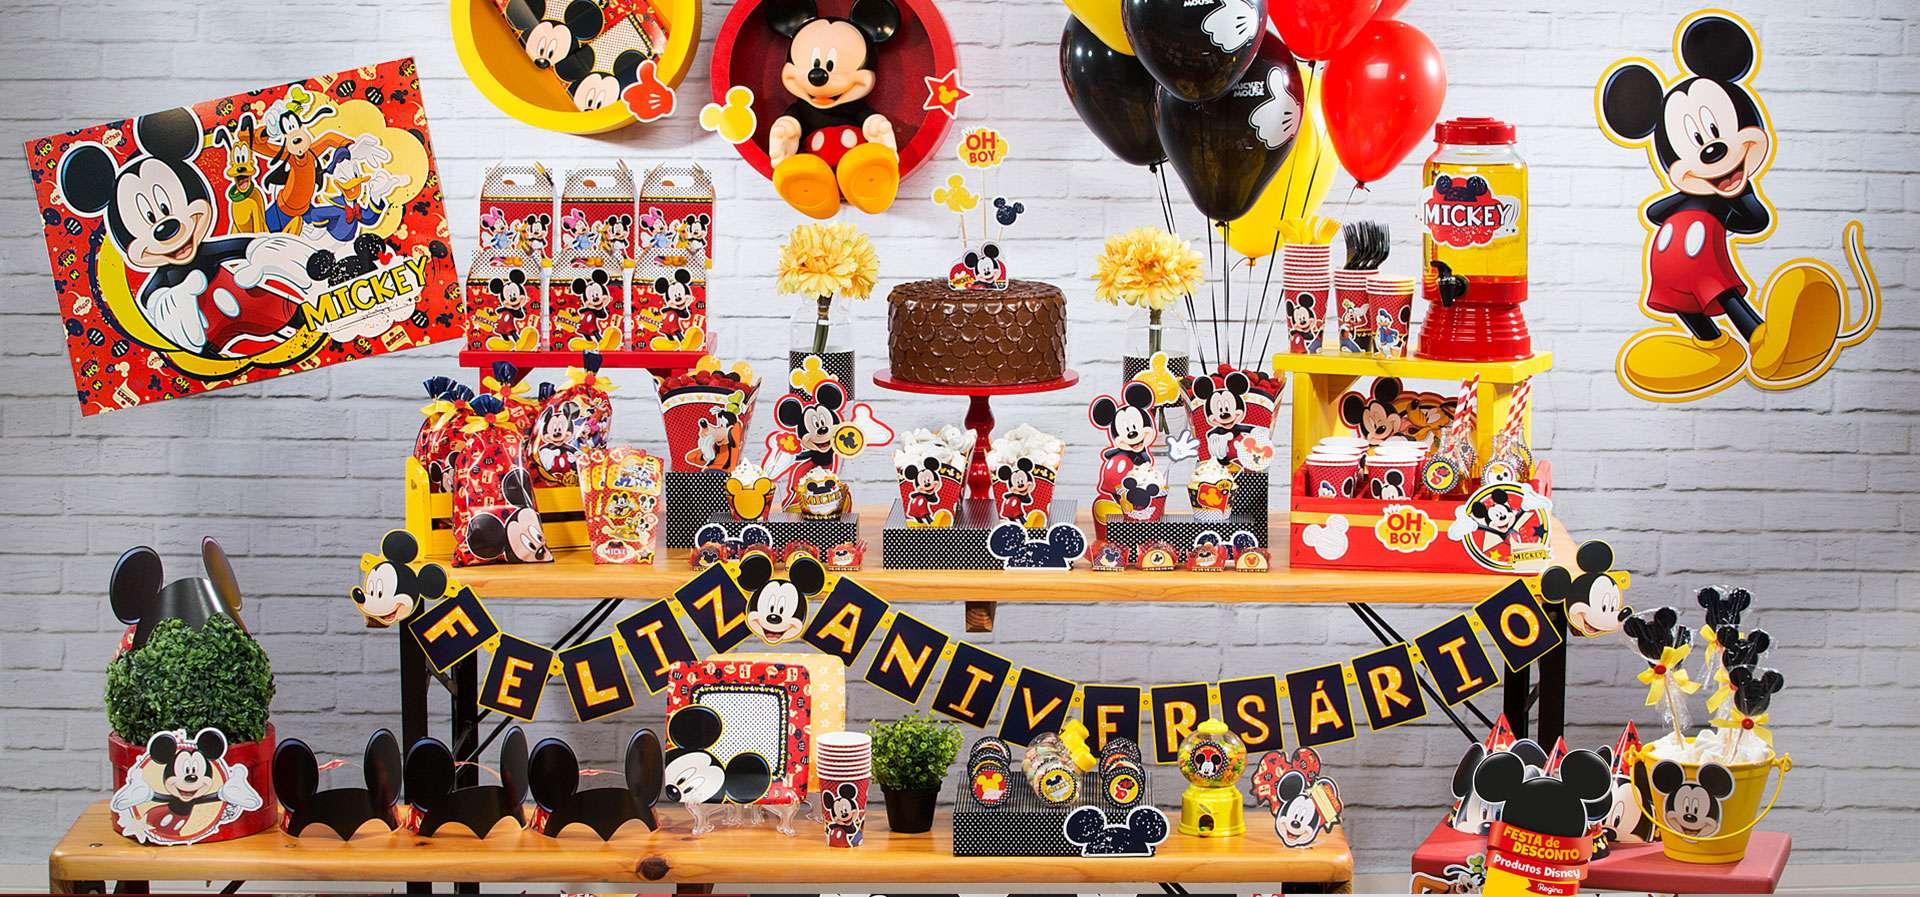 Faixa Feliz Aniversário  Mickey Mouse